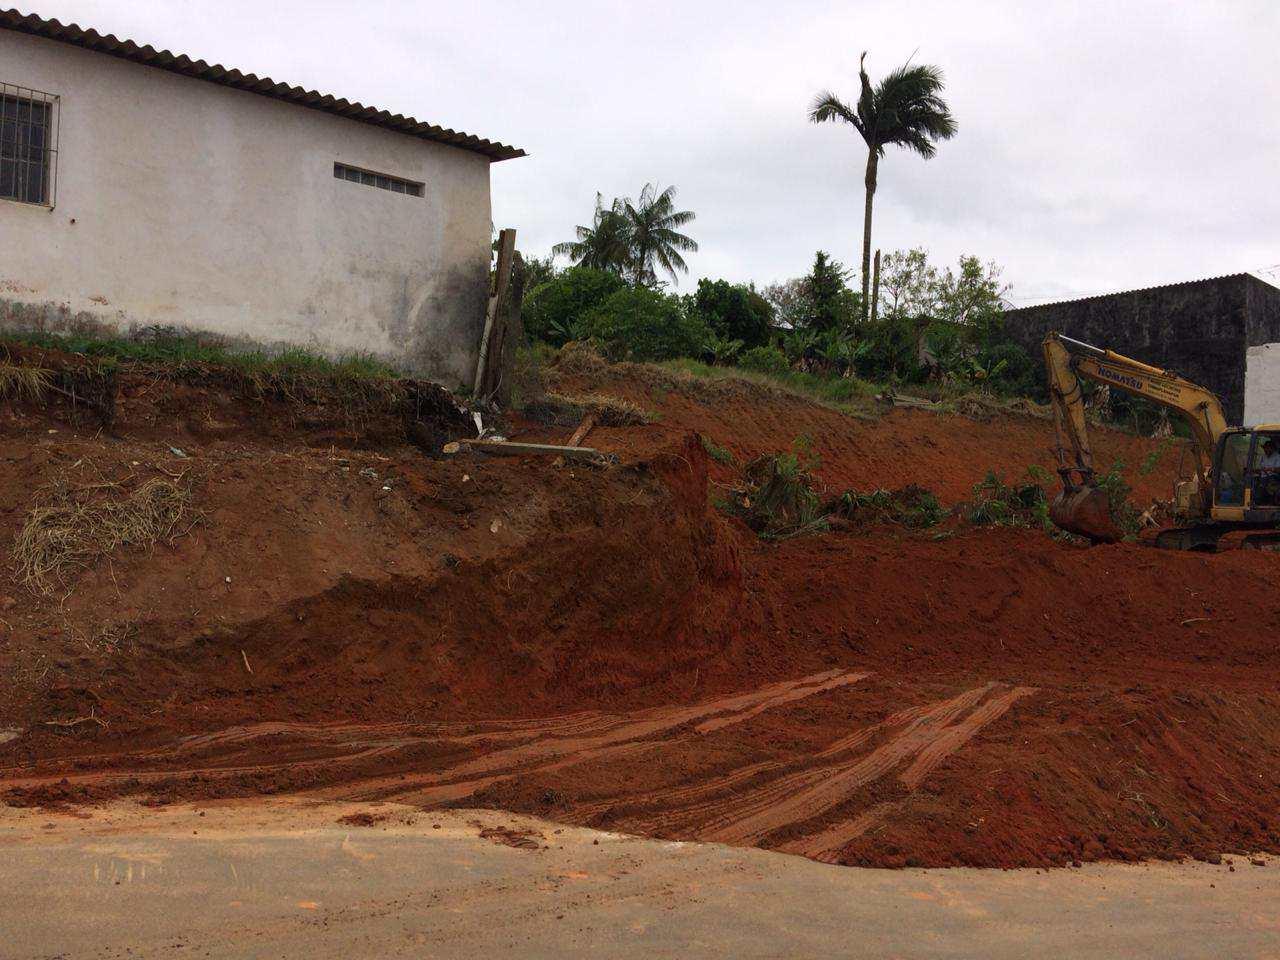 1260m² frente da rodovia, Mogi -Biritiba Mirim só R$ 600 mil.